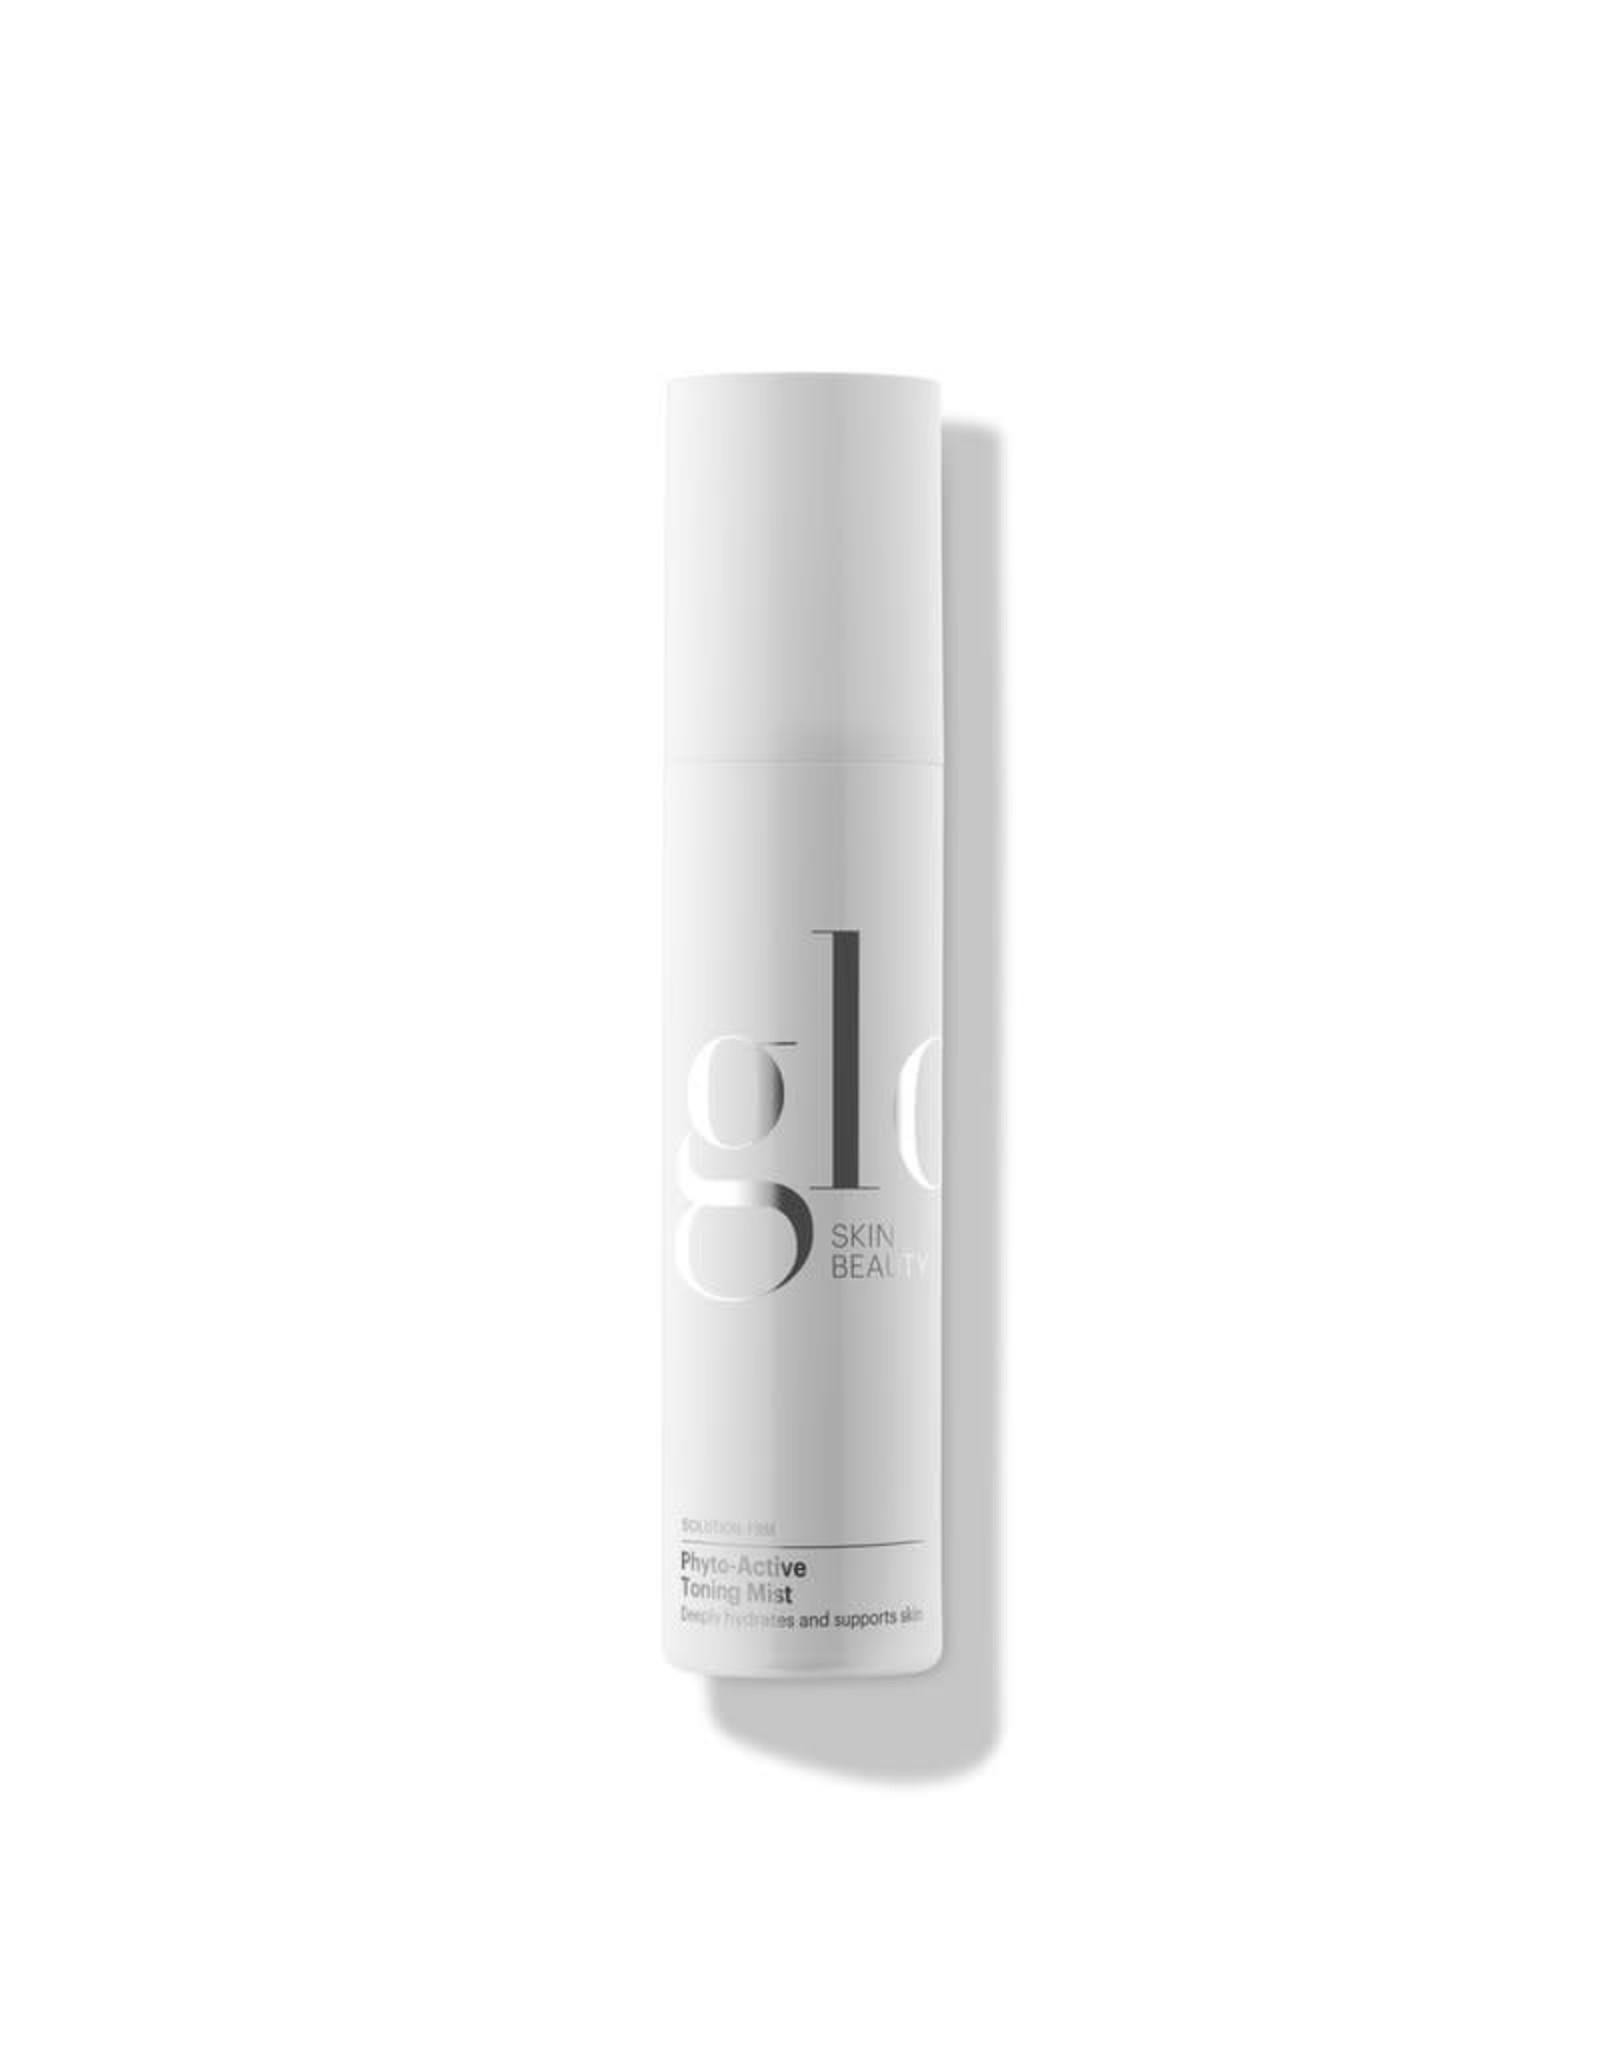 Glo Skin Beauty Phyto-Active Toning Mist